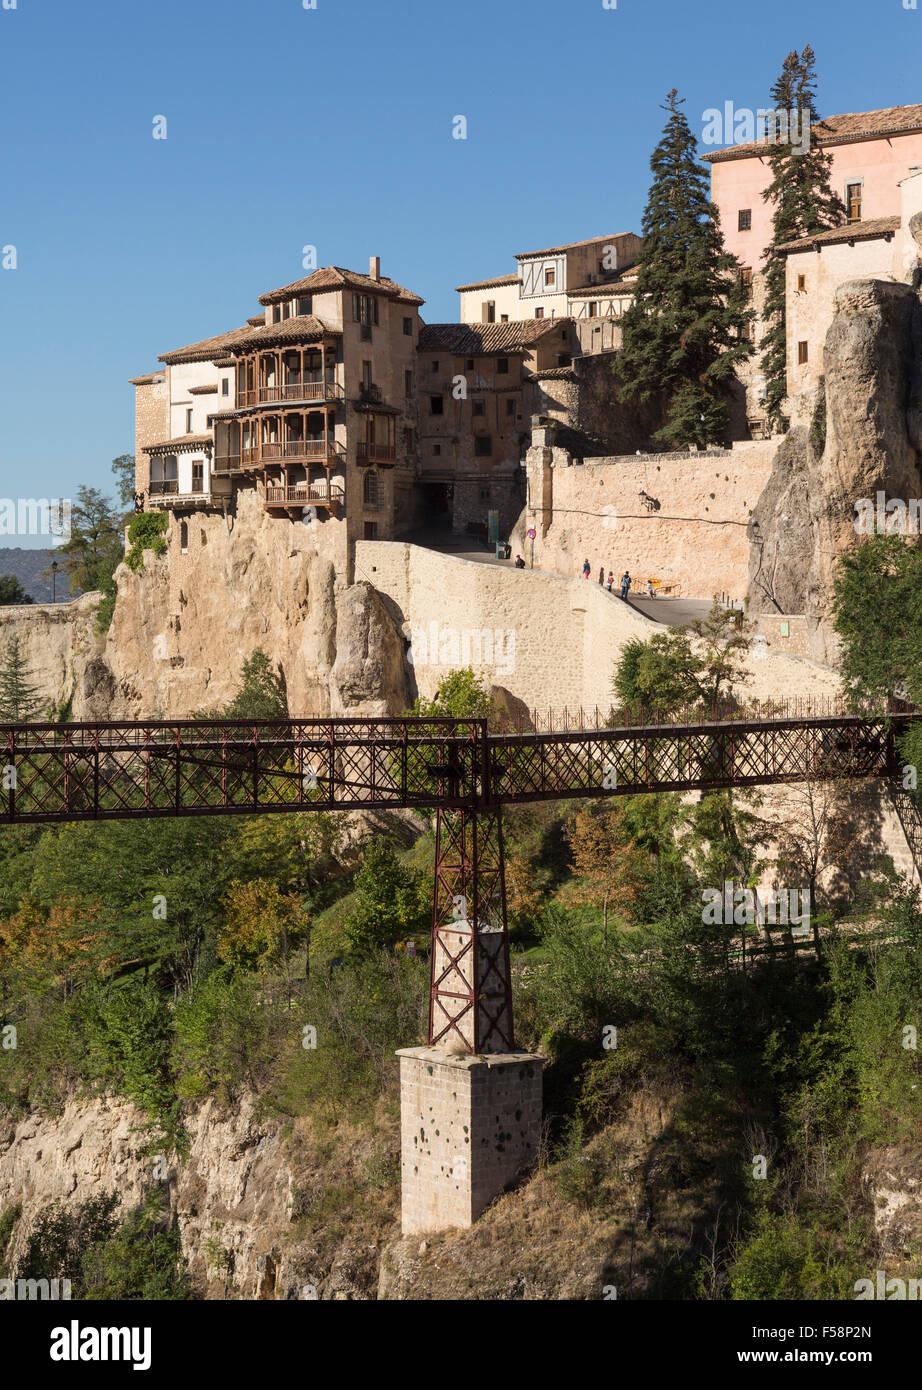 Bridge of St Paul and old town of Cuenca  in Castilla-La Mancha, Spain, Europe - Stock Image